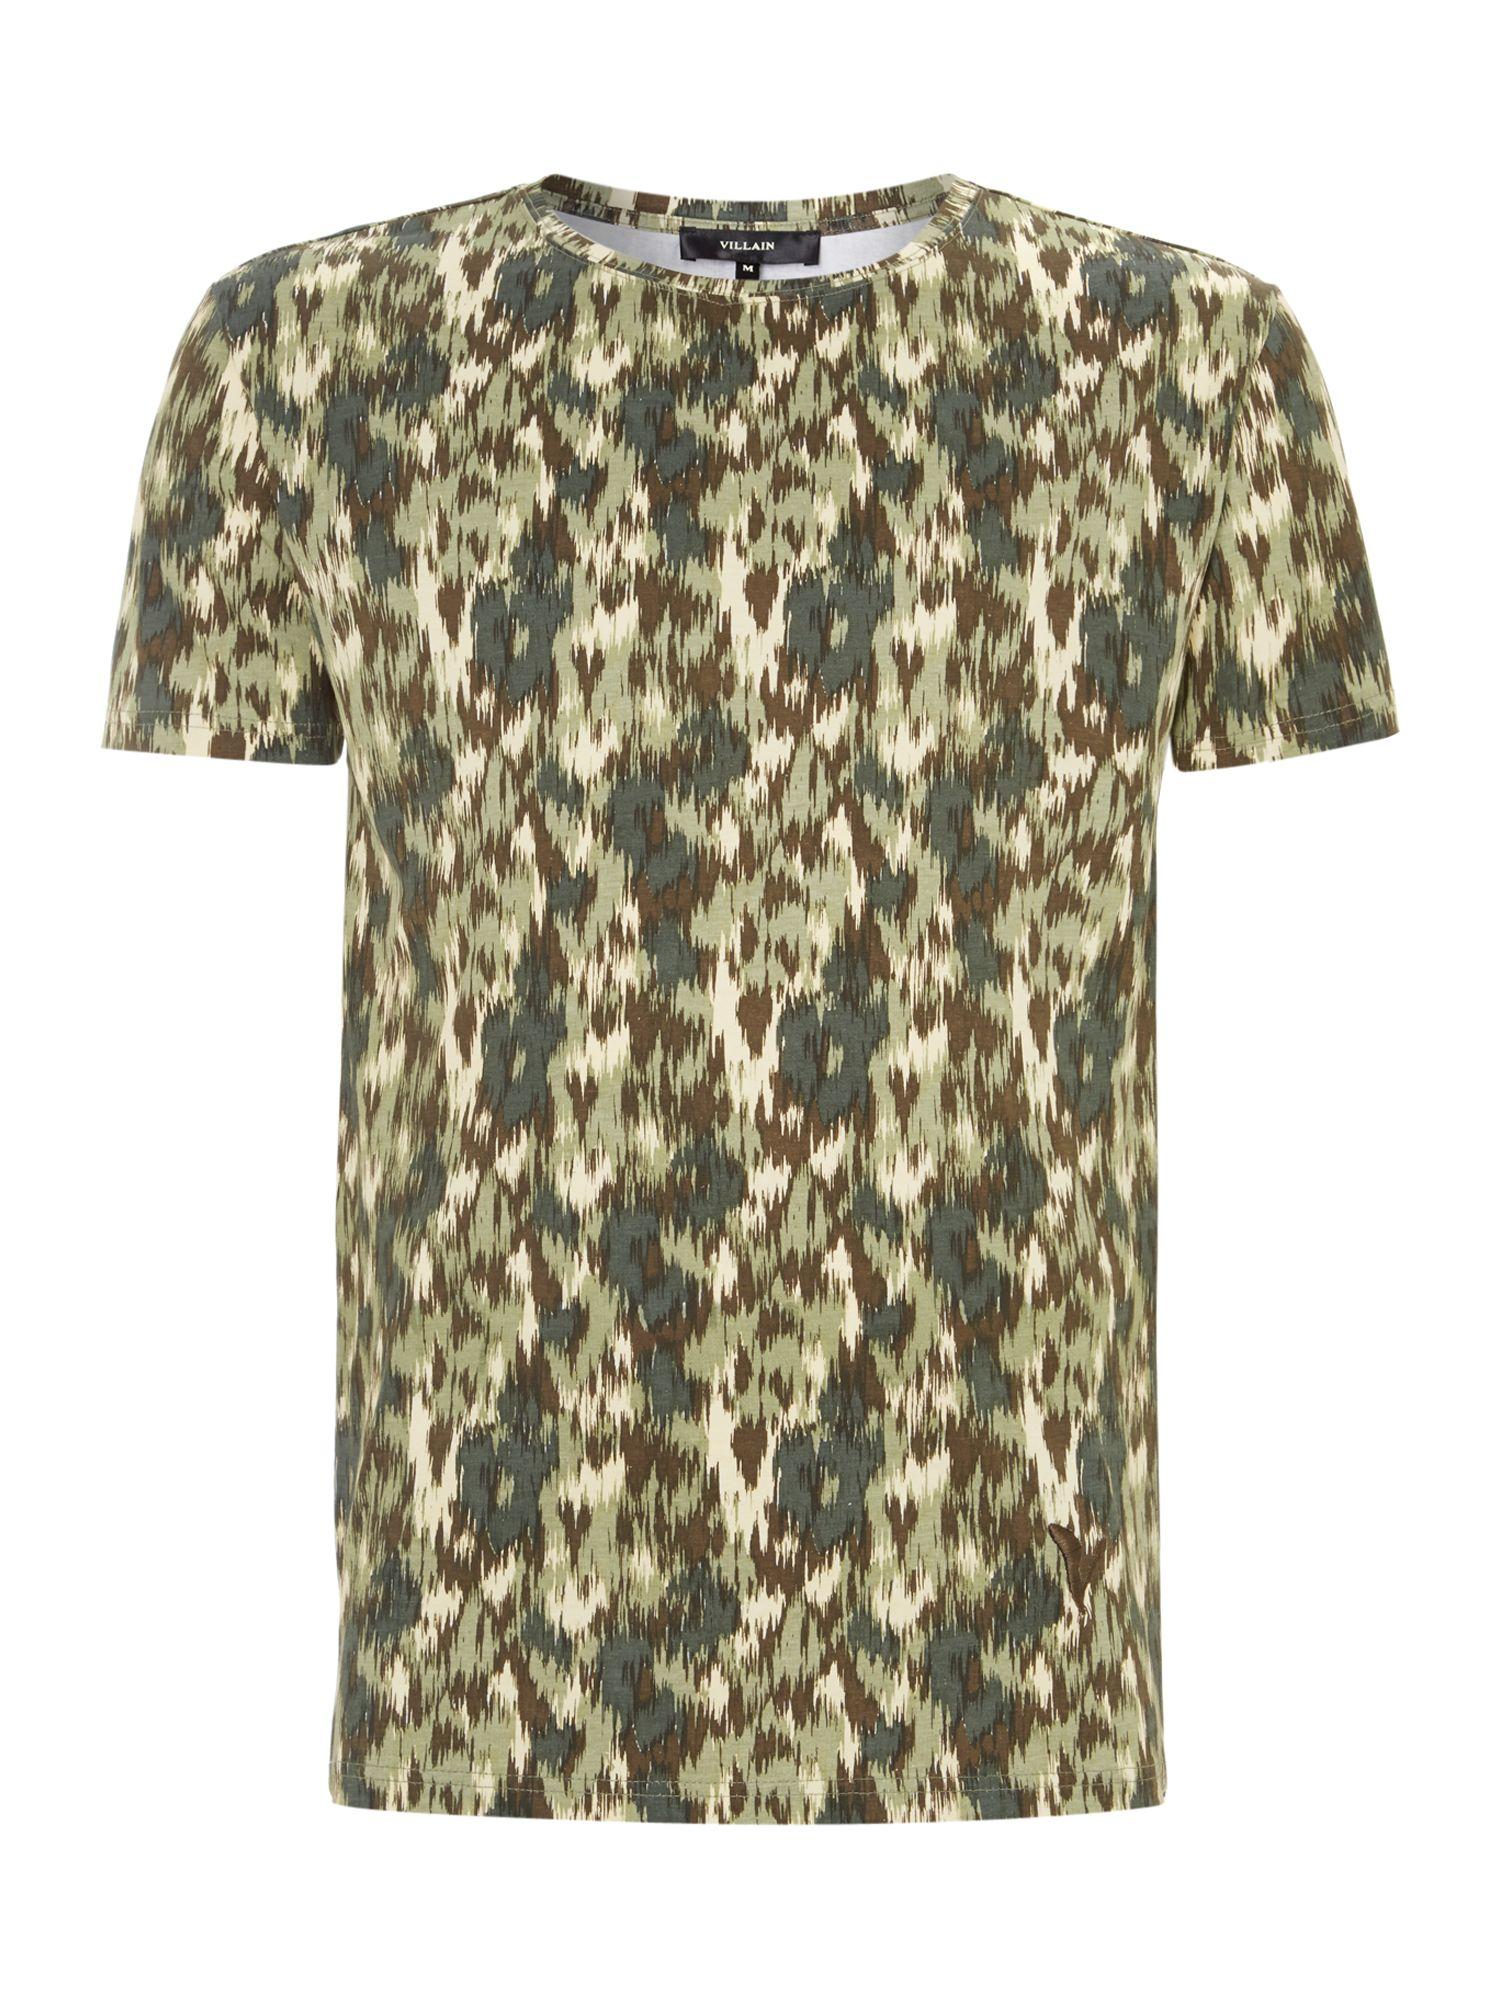 Villain ikat camo printed t shirt in green for men lyst for Camo print t shirt